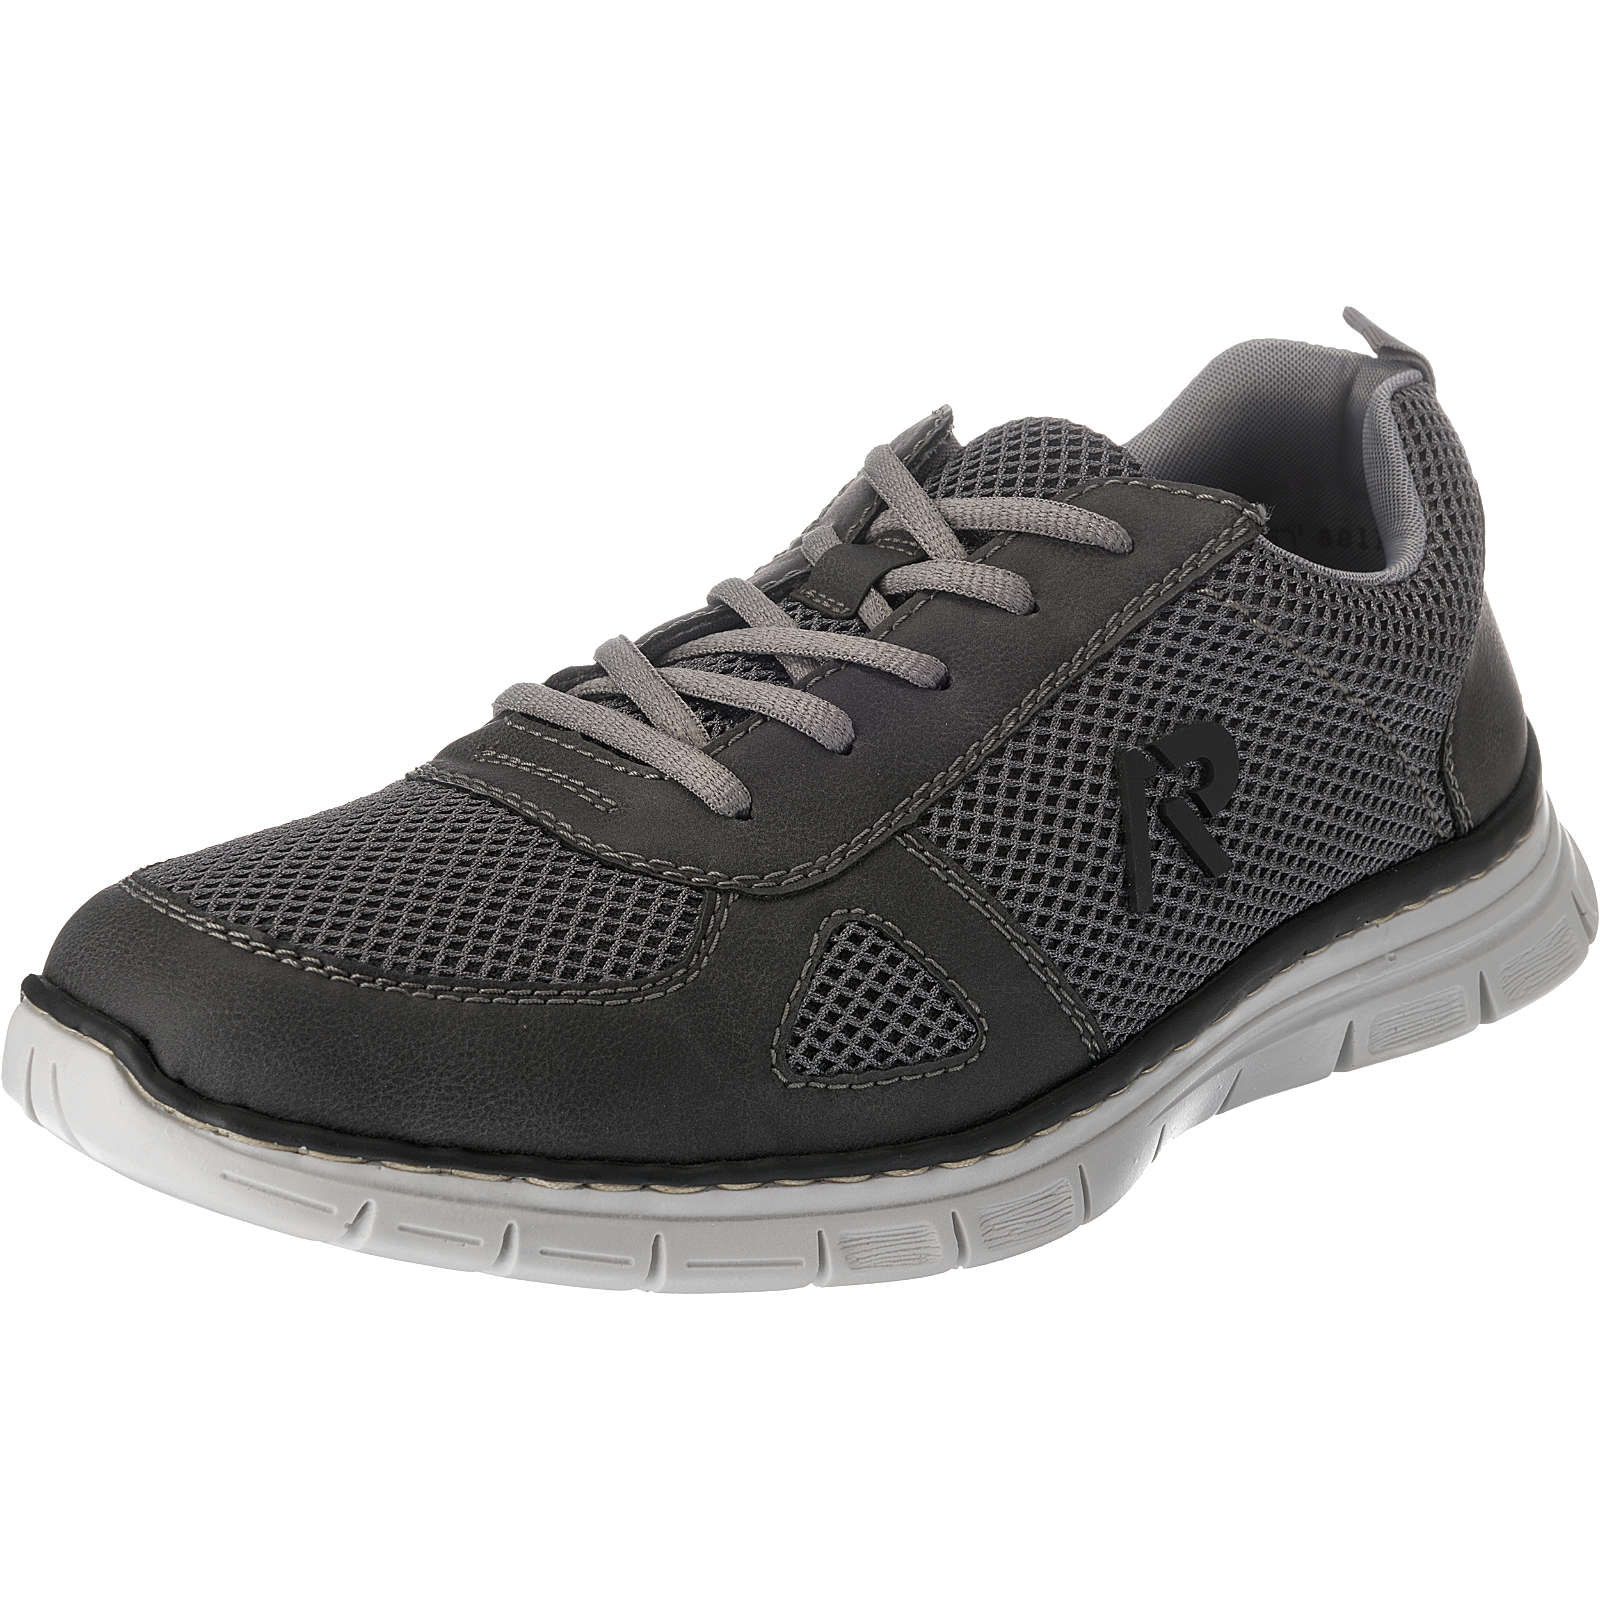 rieker Sneakers Low grau Herren Gr. 45